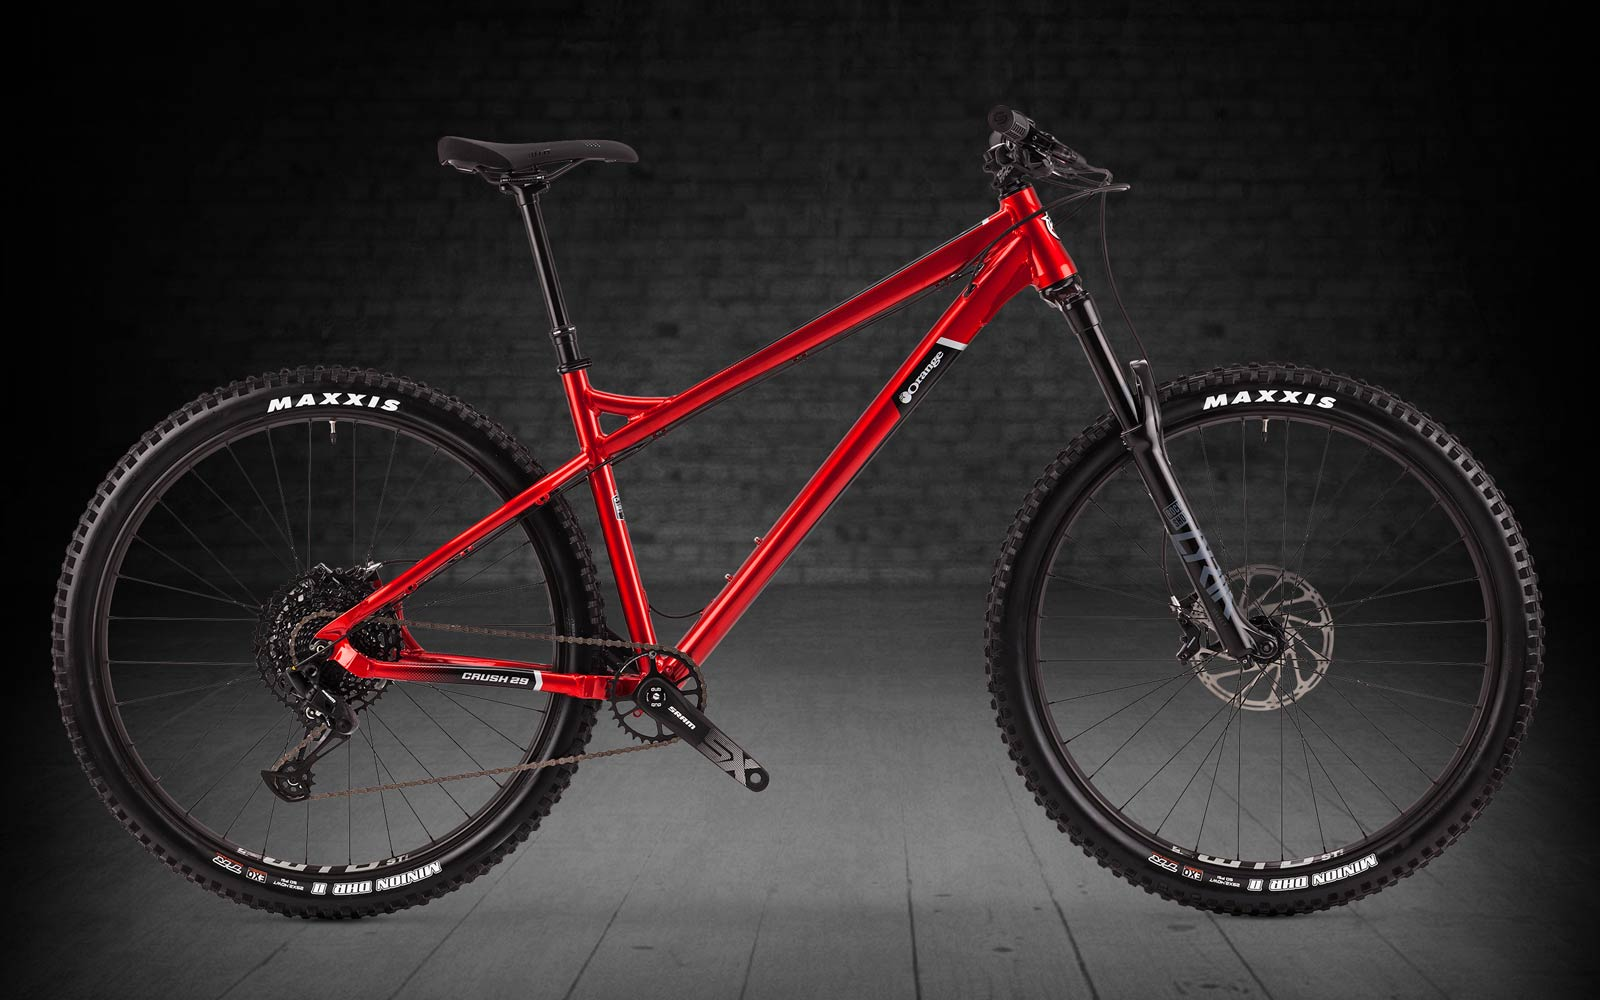 "2022 orange crush pro 29"" hardtail mountain bike aluminium frame red"